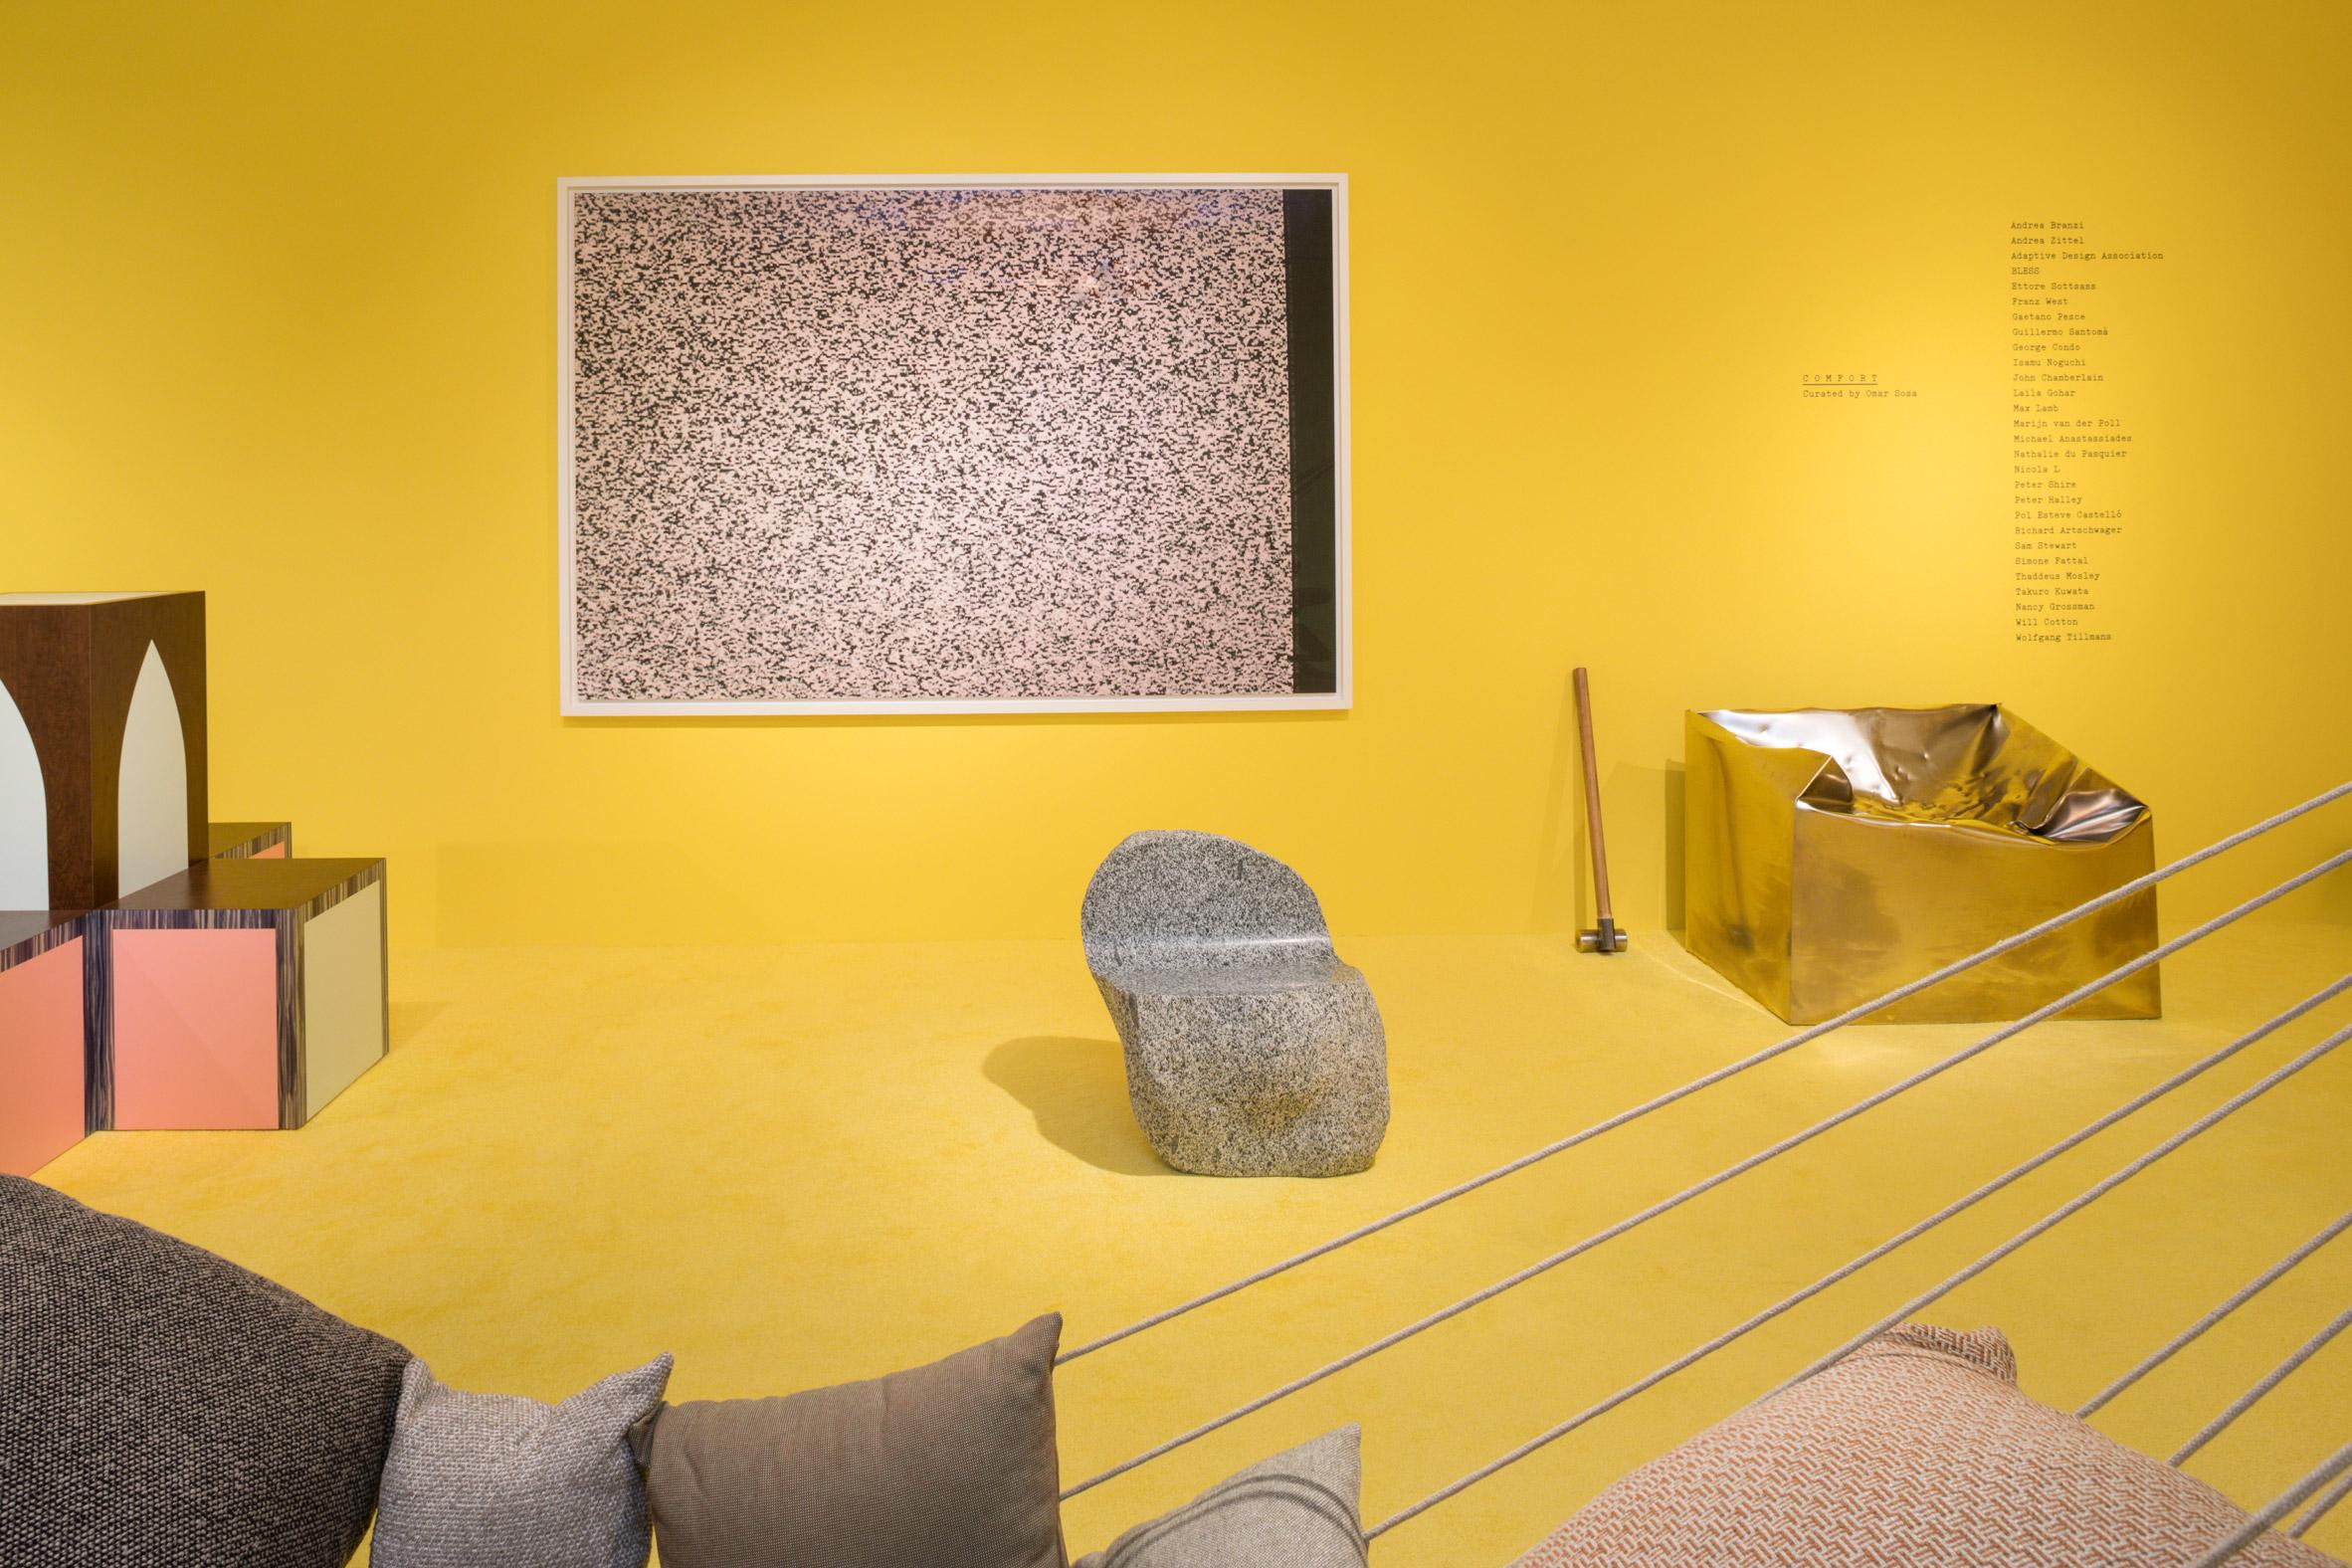 Comfort by Omar Sosa at Friedman Benda